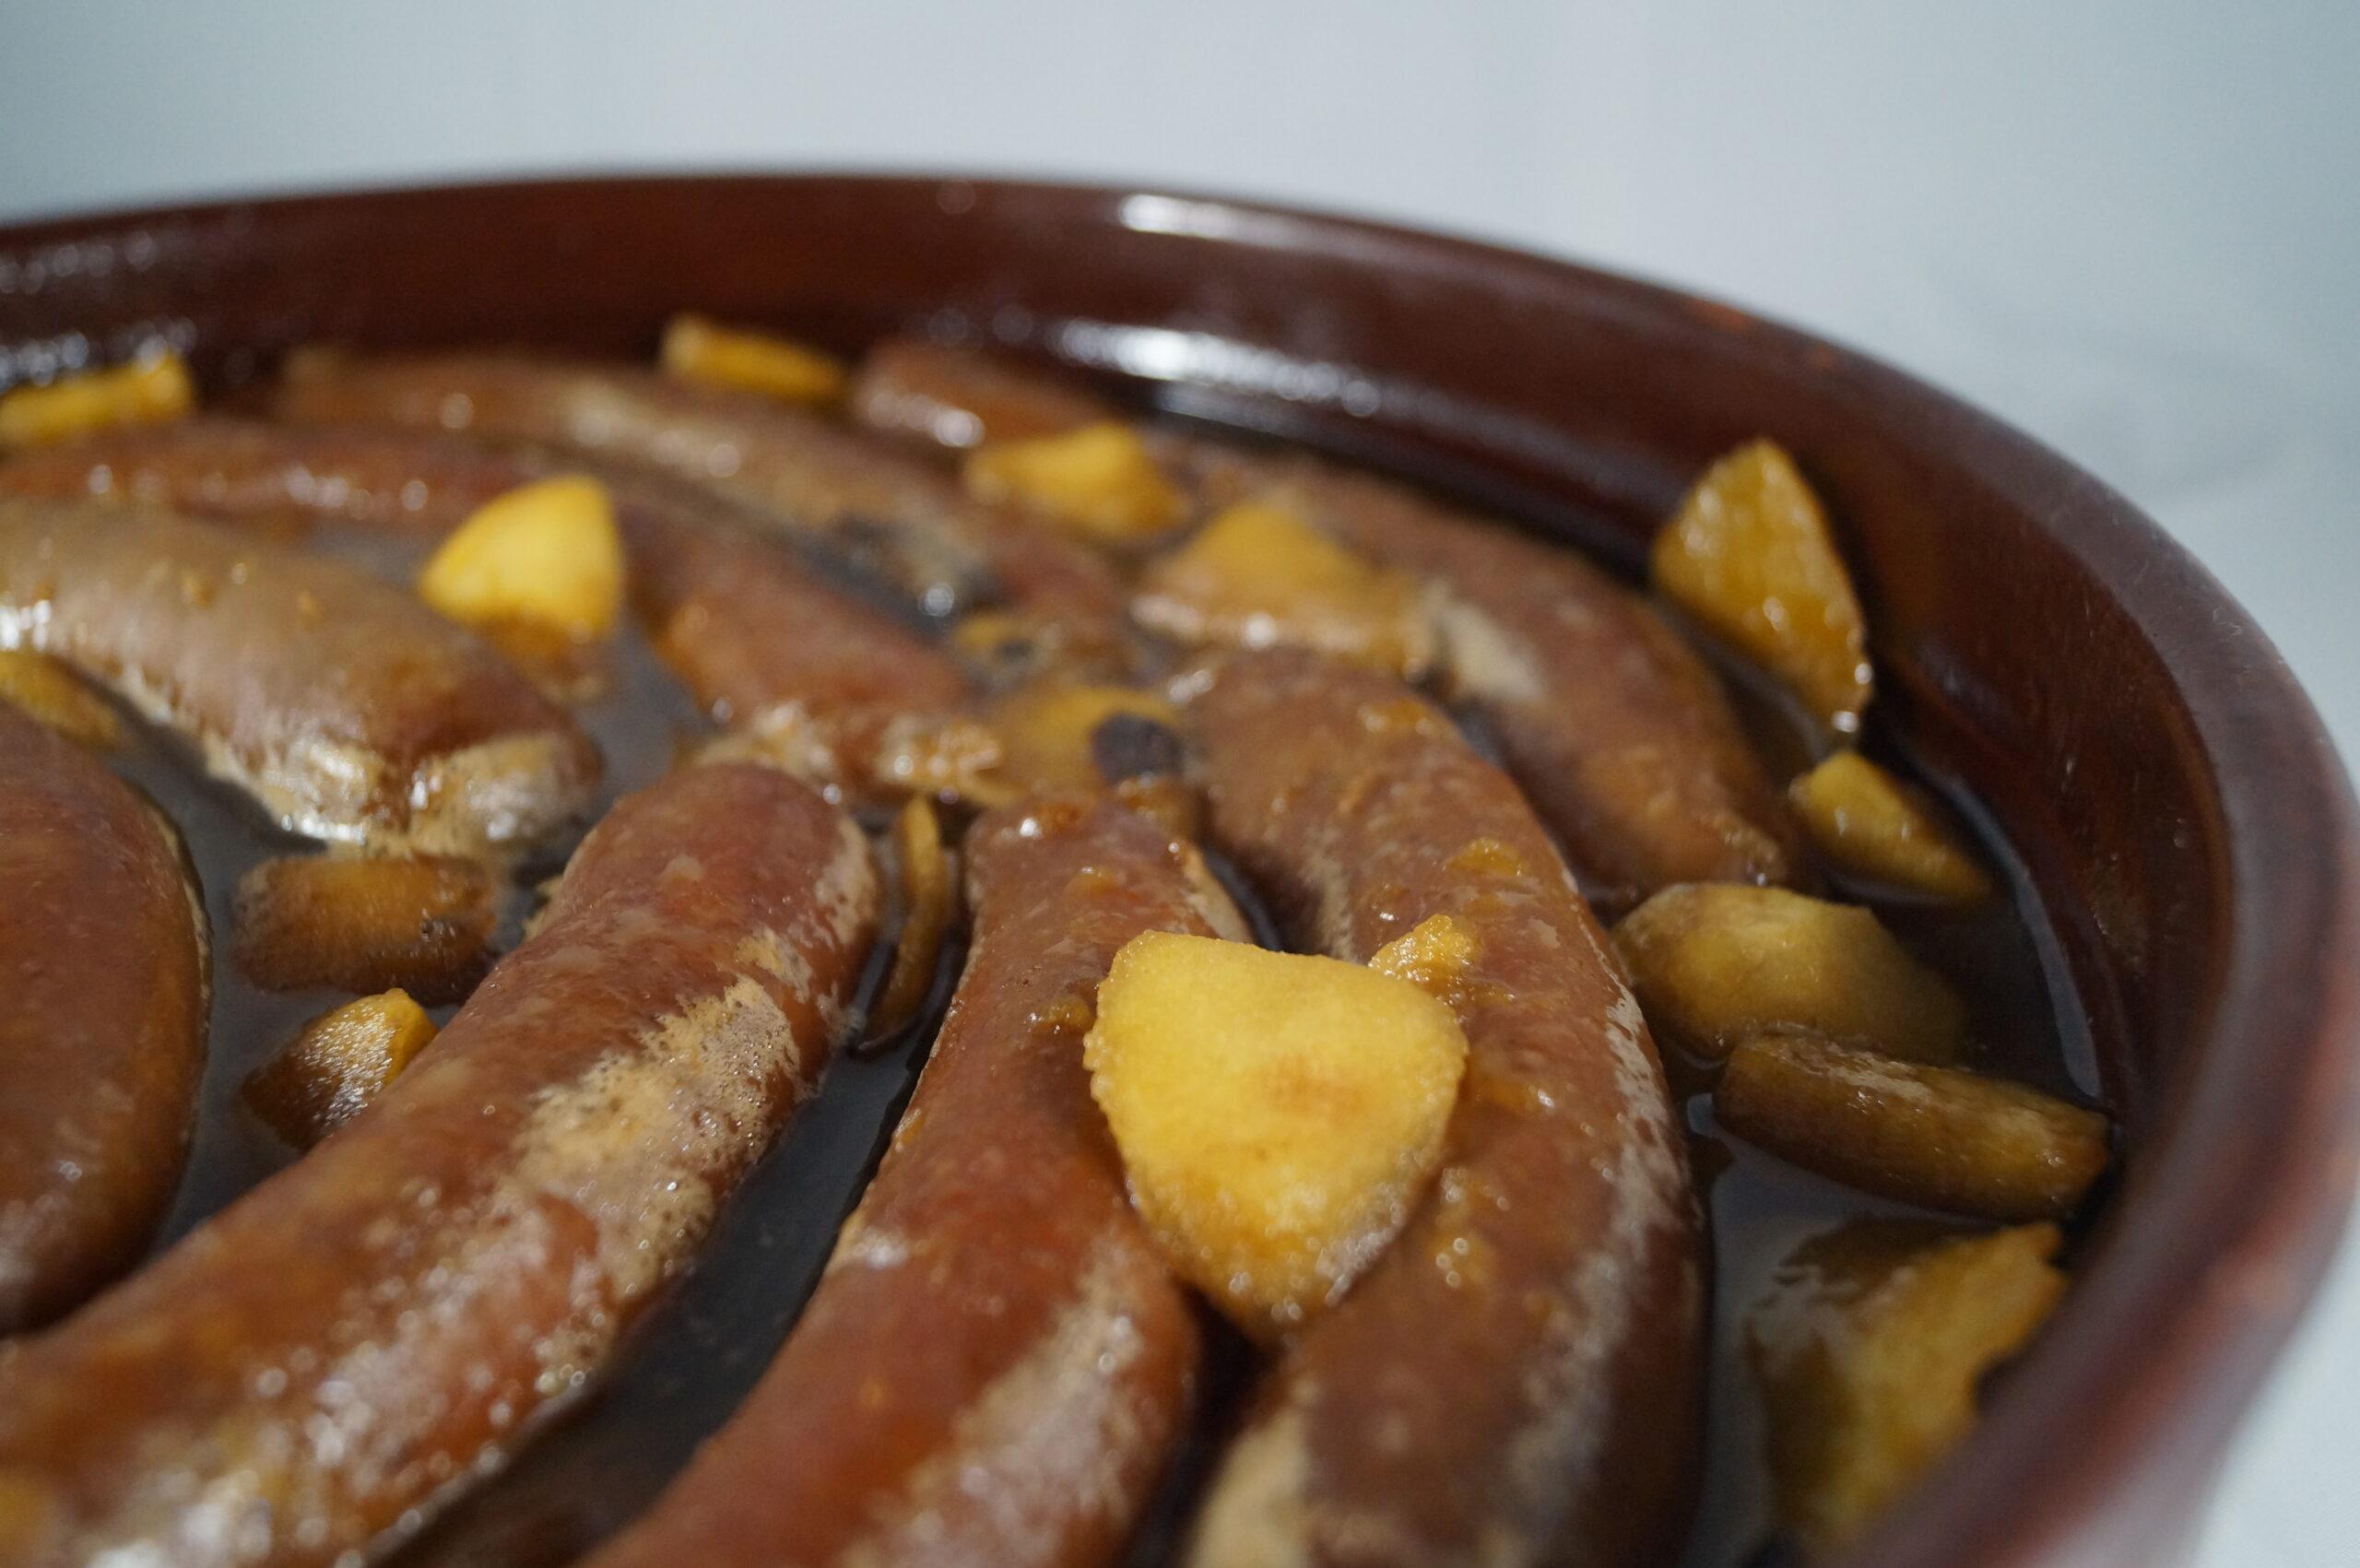 Botifarres dolces | Gremi de Carnissers i Xarcuters Artesans de les Comarques Gironines